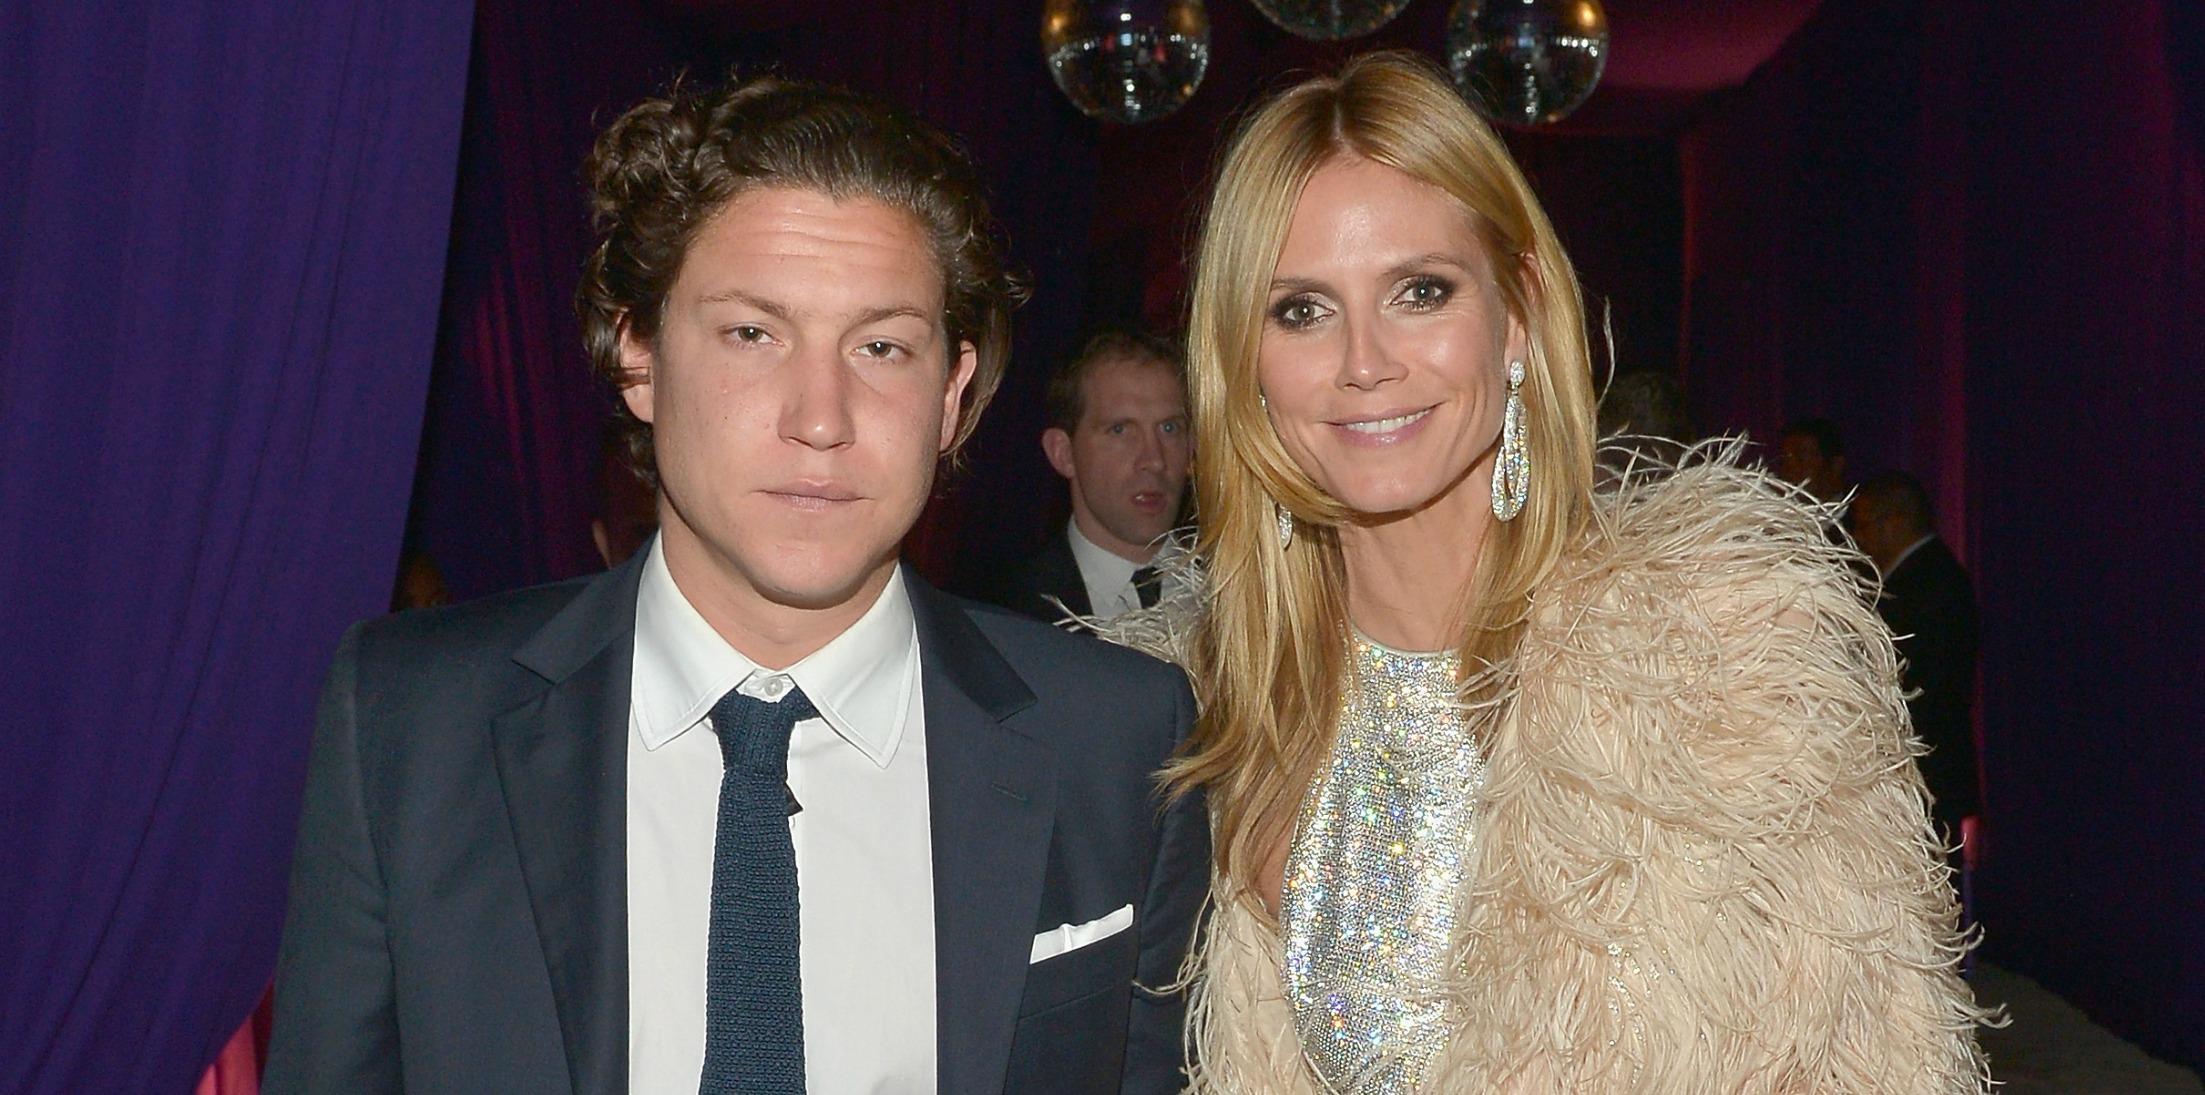 Heidi Klum Boyfriend Vito Schnabel Cheating Rumors Long